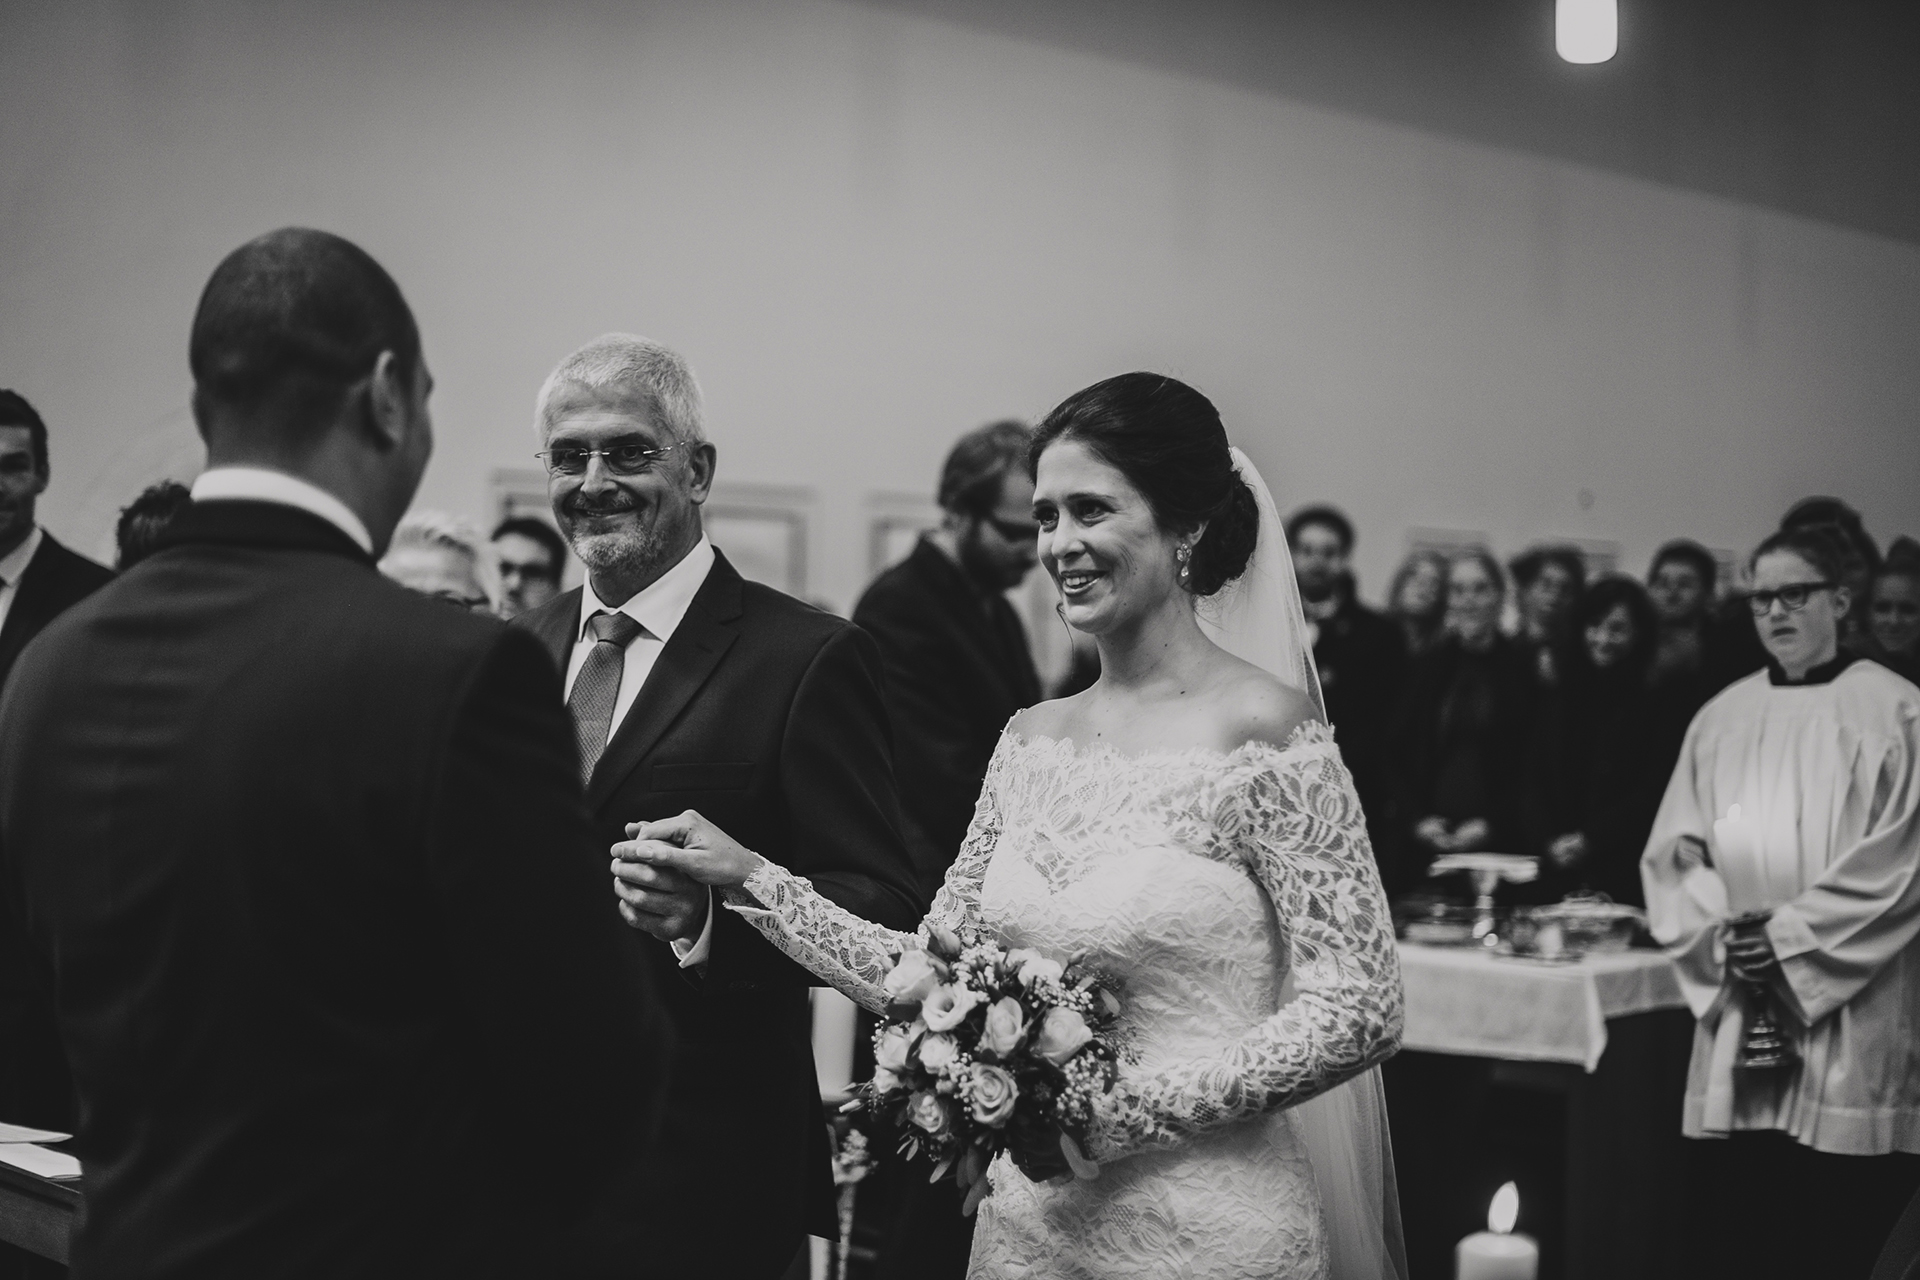 Hochzeitsreportage_J&D_016_Caroline Queda Fotografie